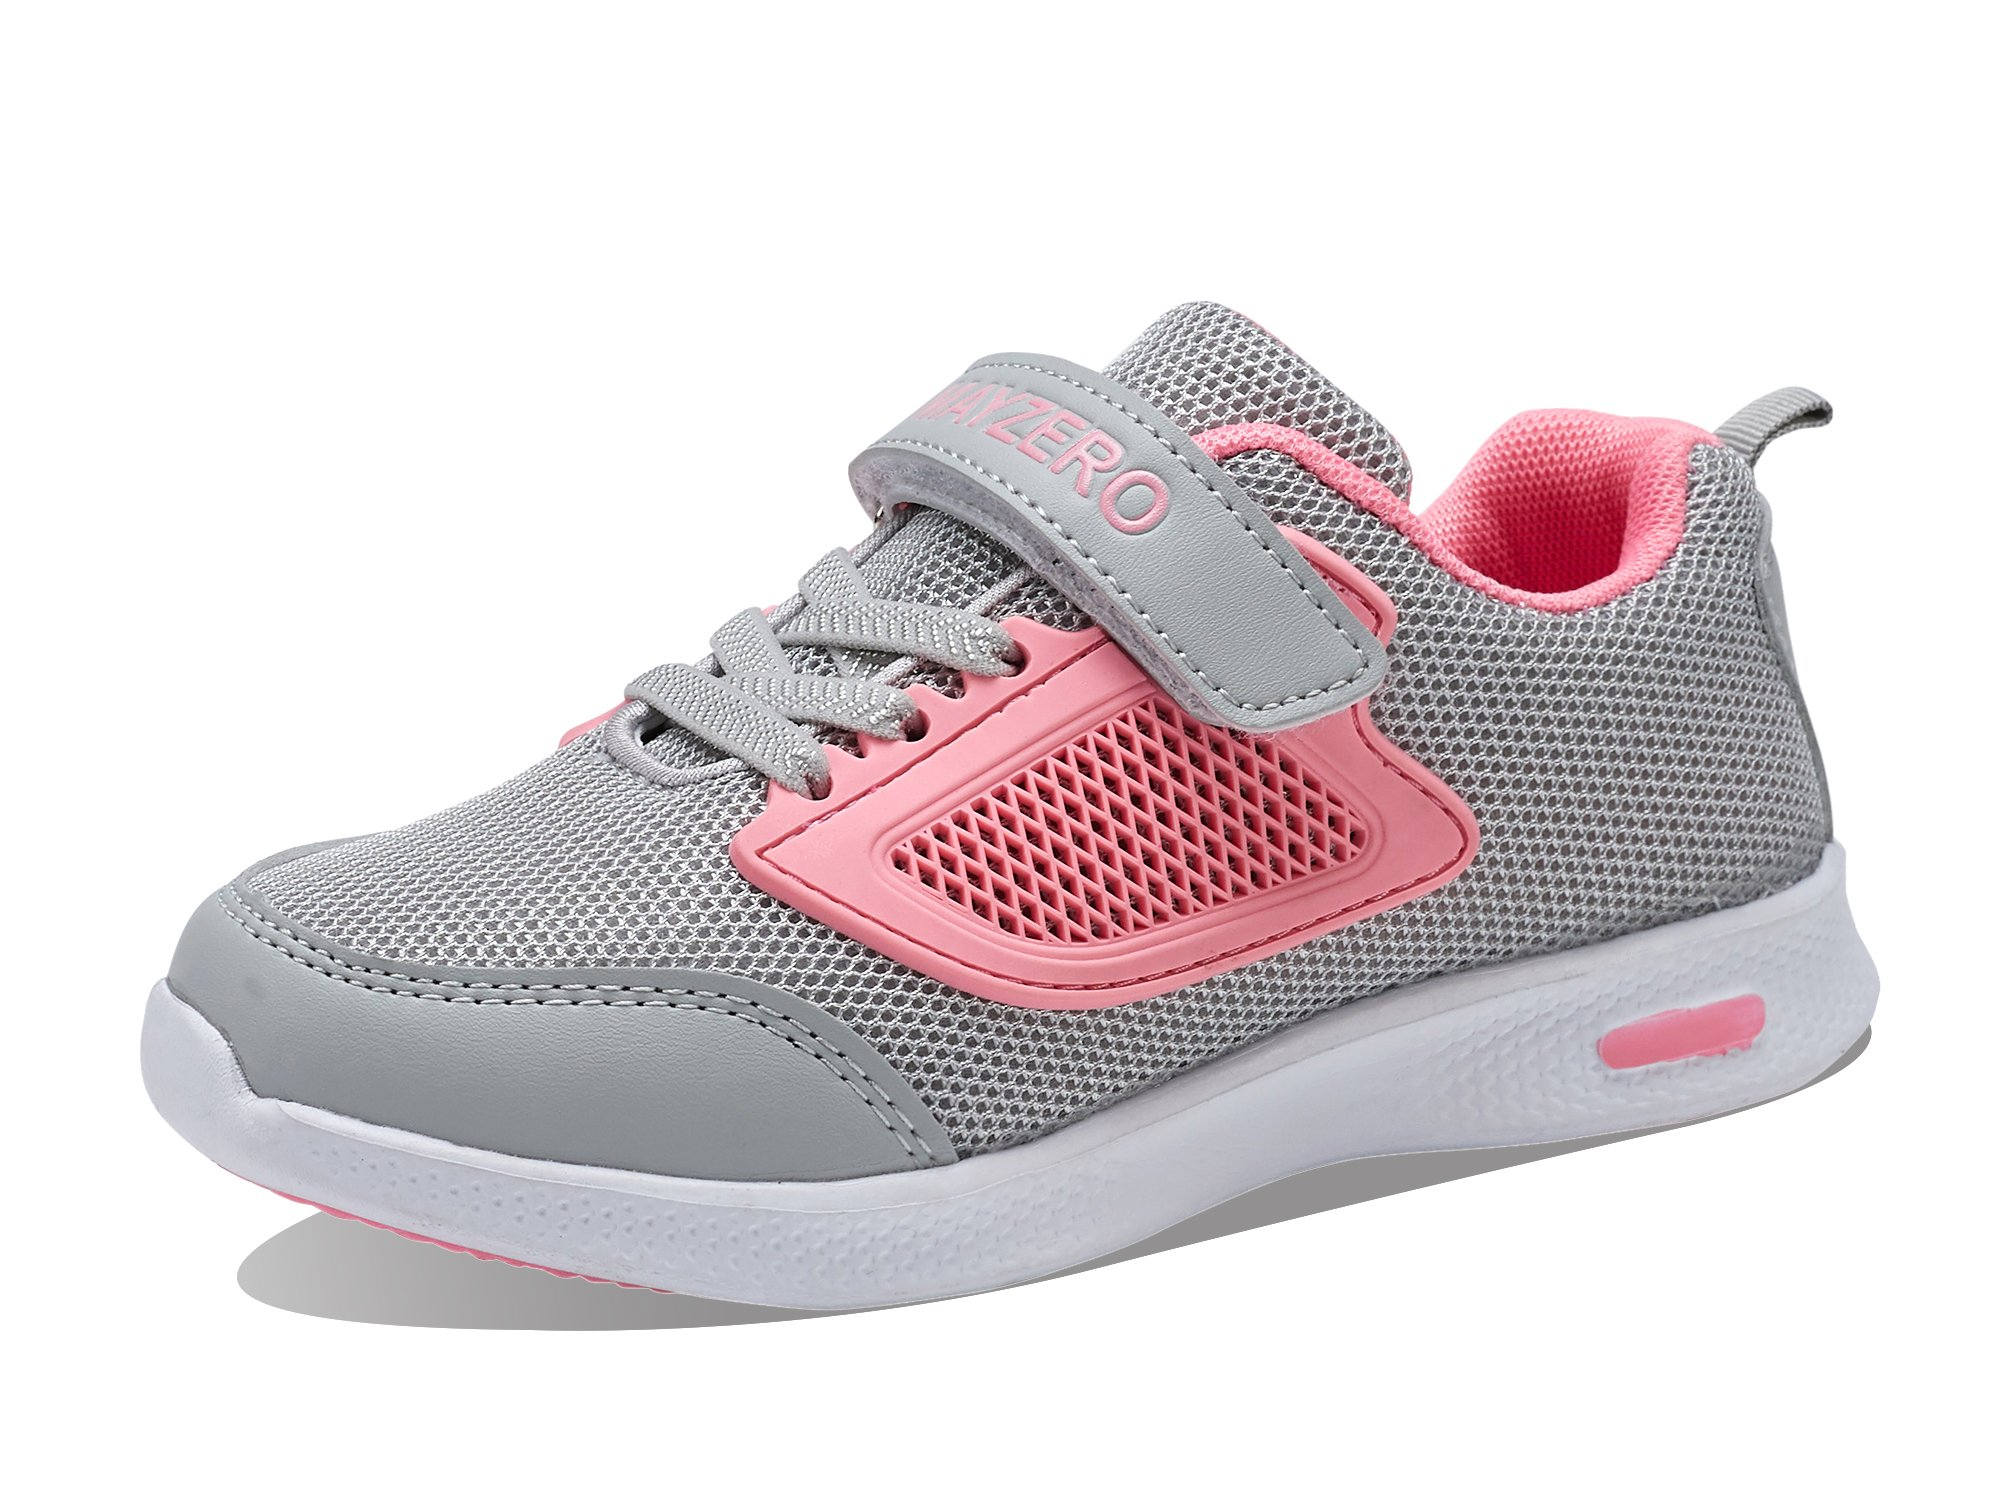 d0790423de2e6 Vivay Children Kids Sneakers Breathable Athletic Running Walking Tennis  Shoes for Girls (2# Pink,3 Little Kid)